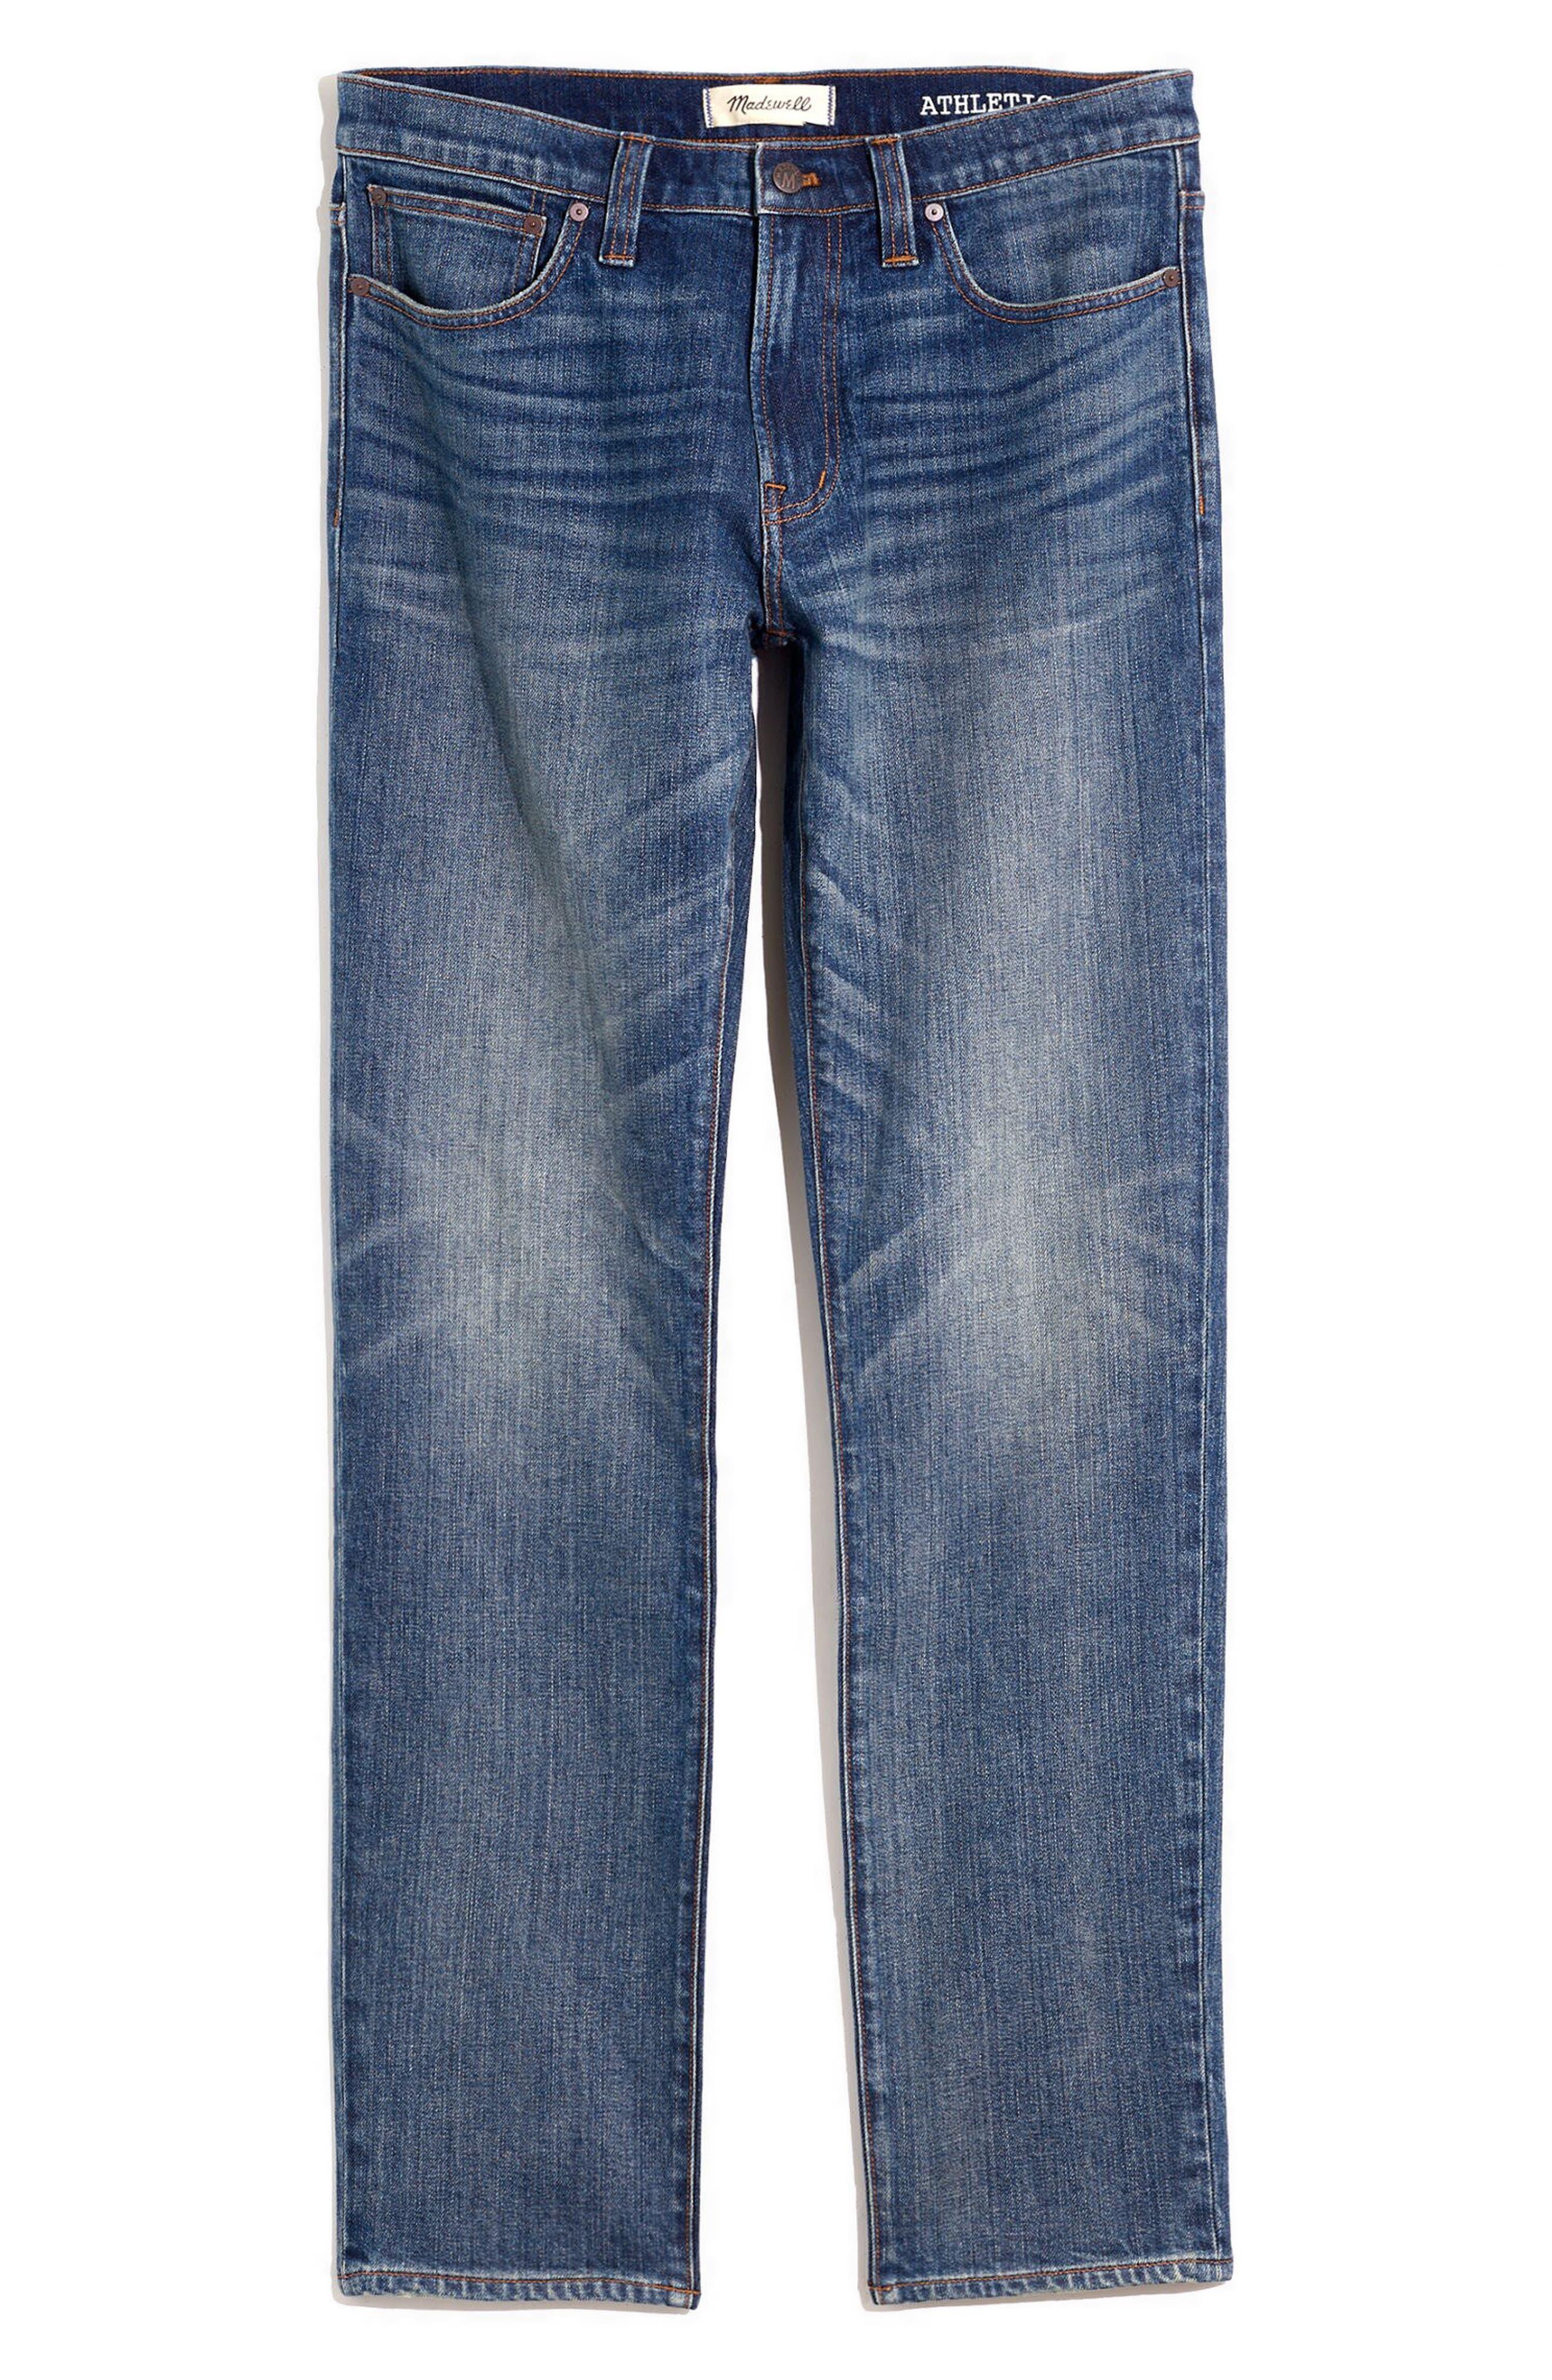 Athletic Slim Authentic Flex Jeans